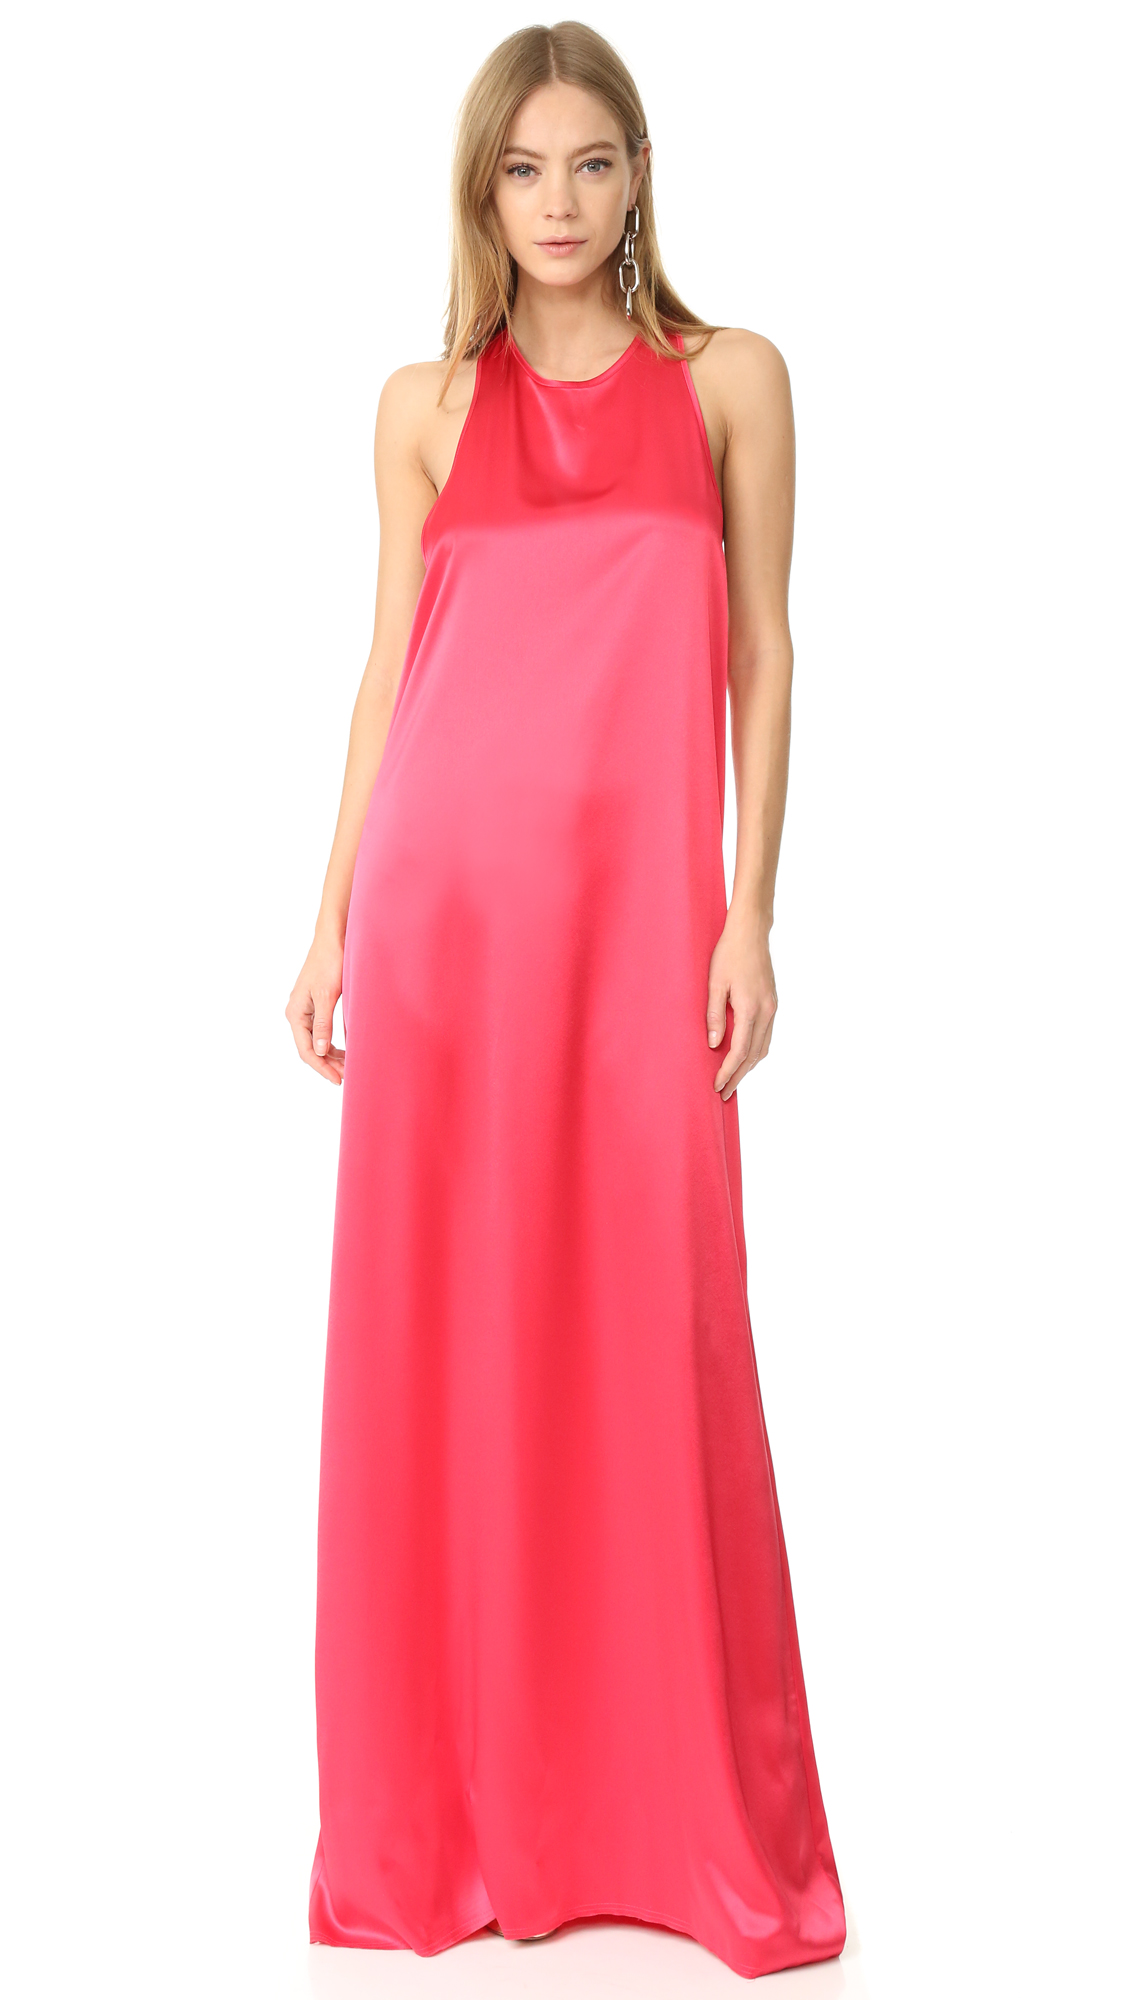 Baja East Sleeveless Maxi Dress - Fuchsia